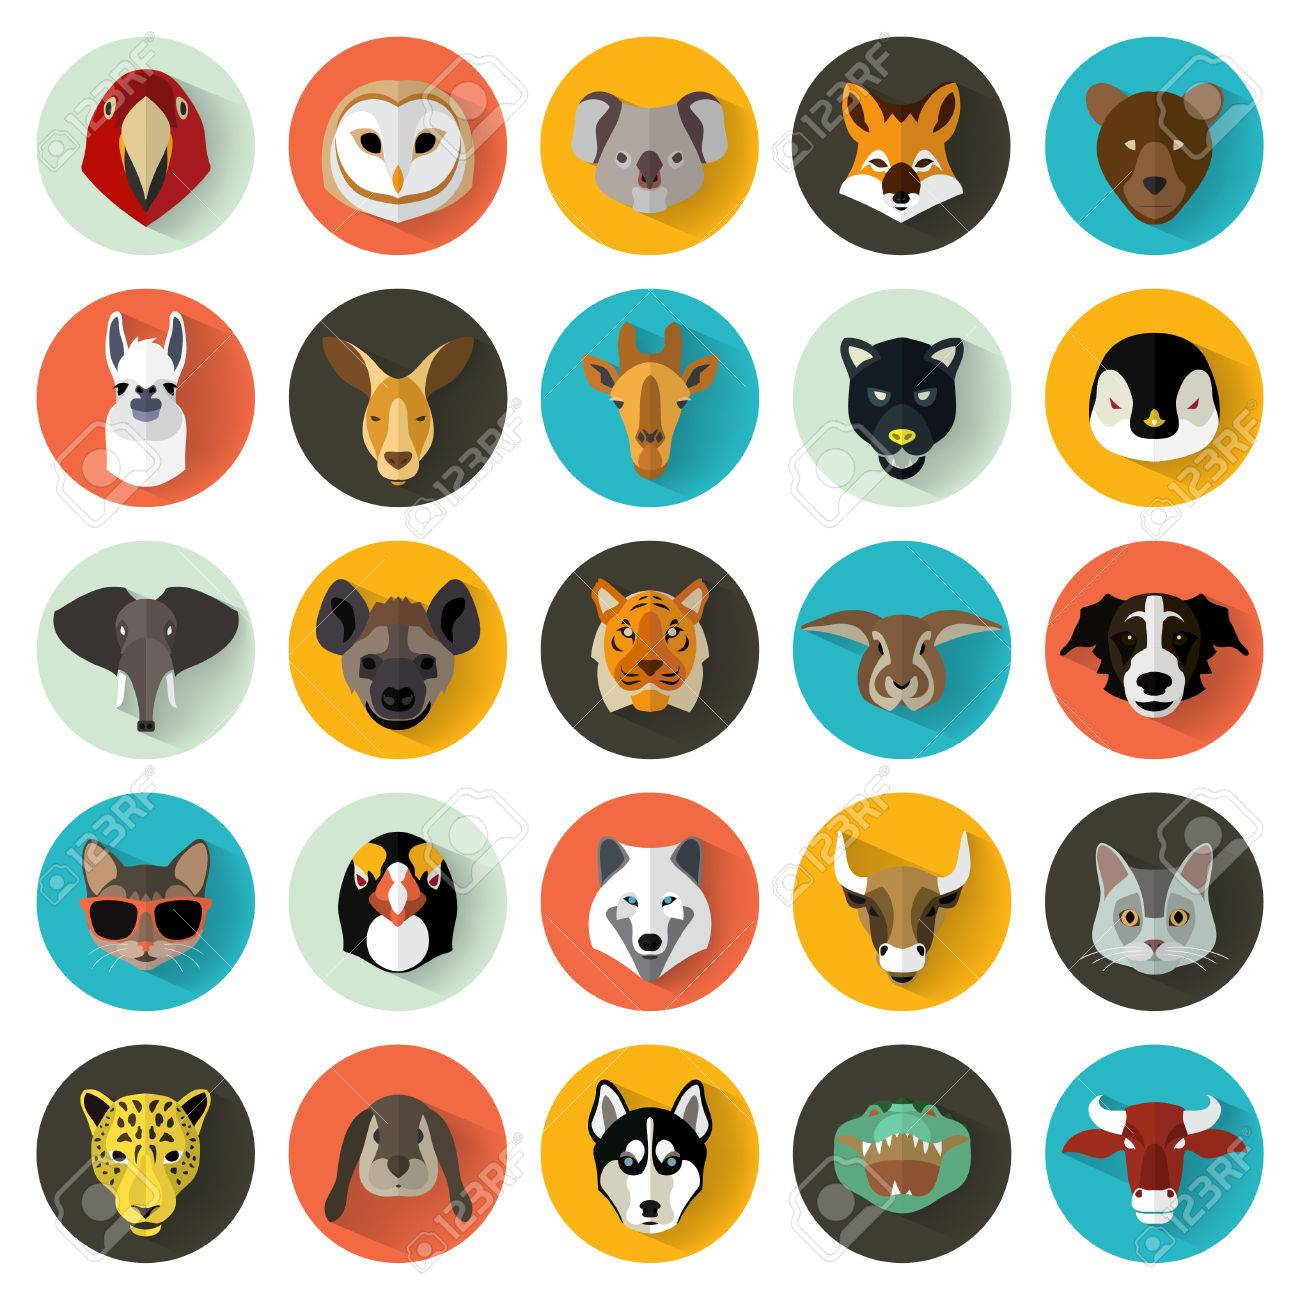 Animal Portrait Set with Flat Design / Vector Illustration - 53345018